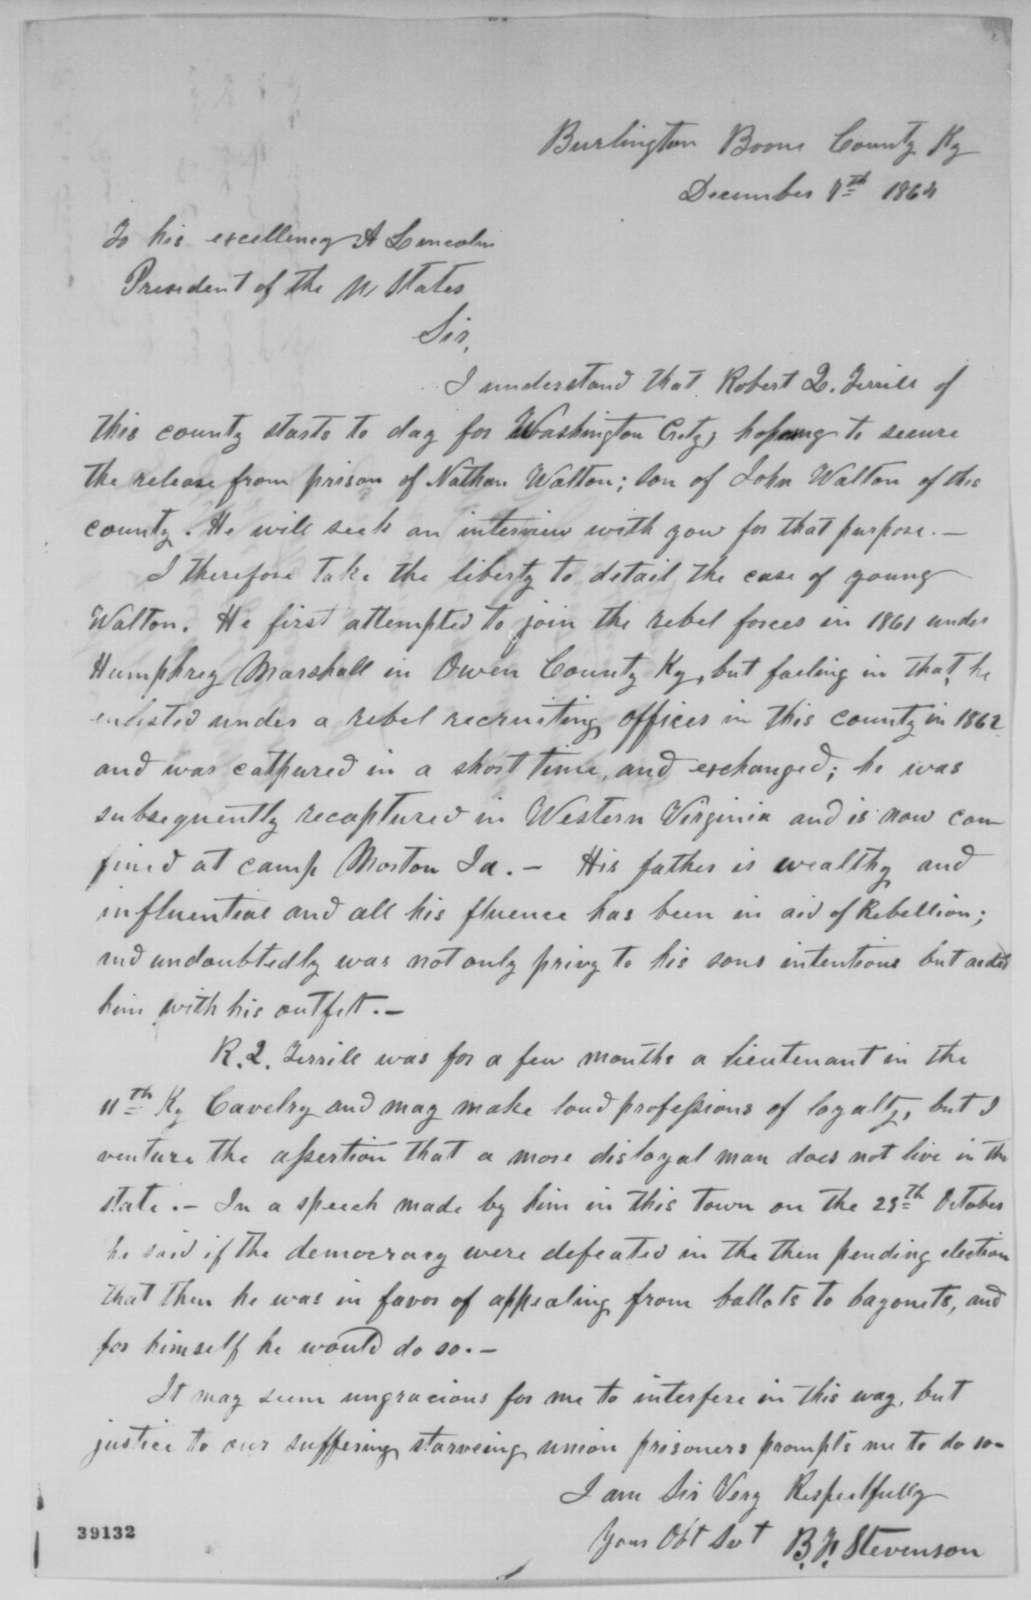 B. F. Stevenson to Abraham Lincoln, Wednesday, December 07, 1864  (Case of Nathan Walton; endorsed by James Calvert)